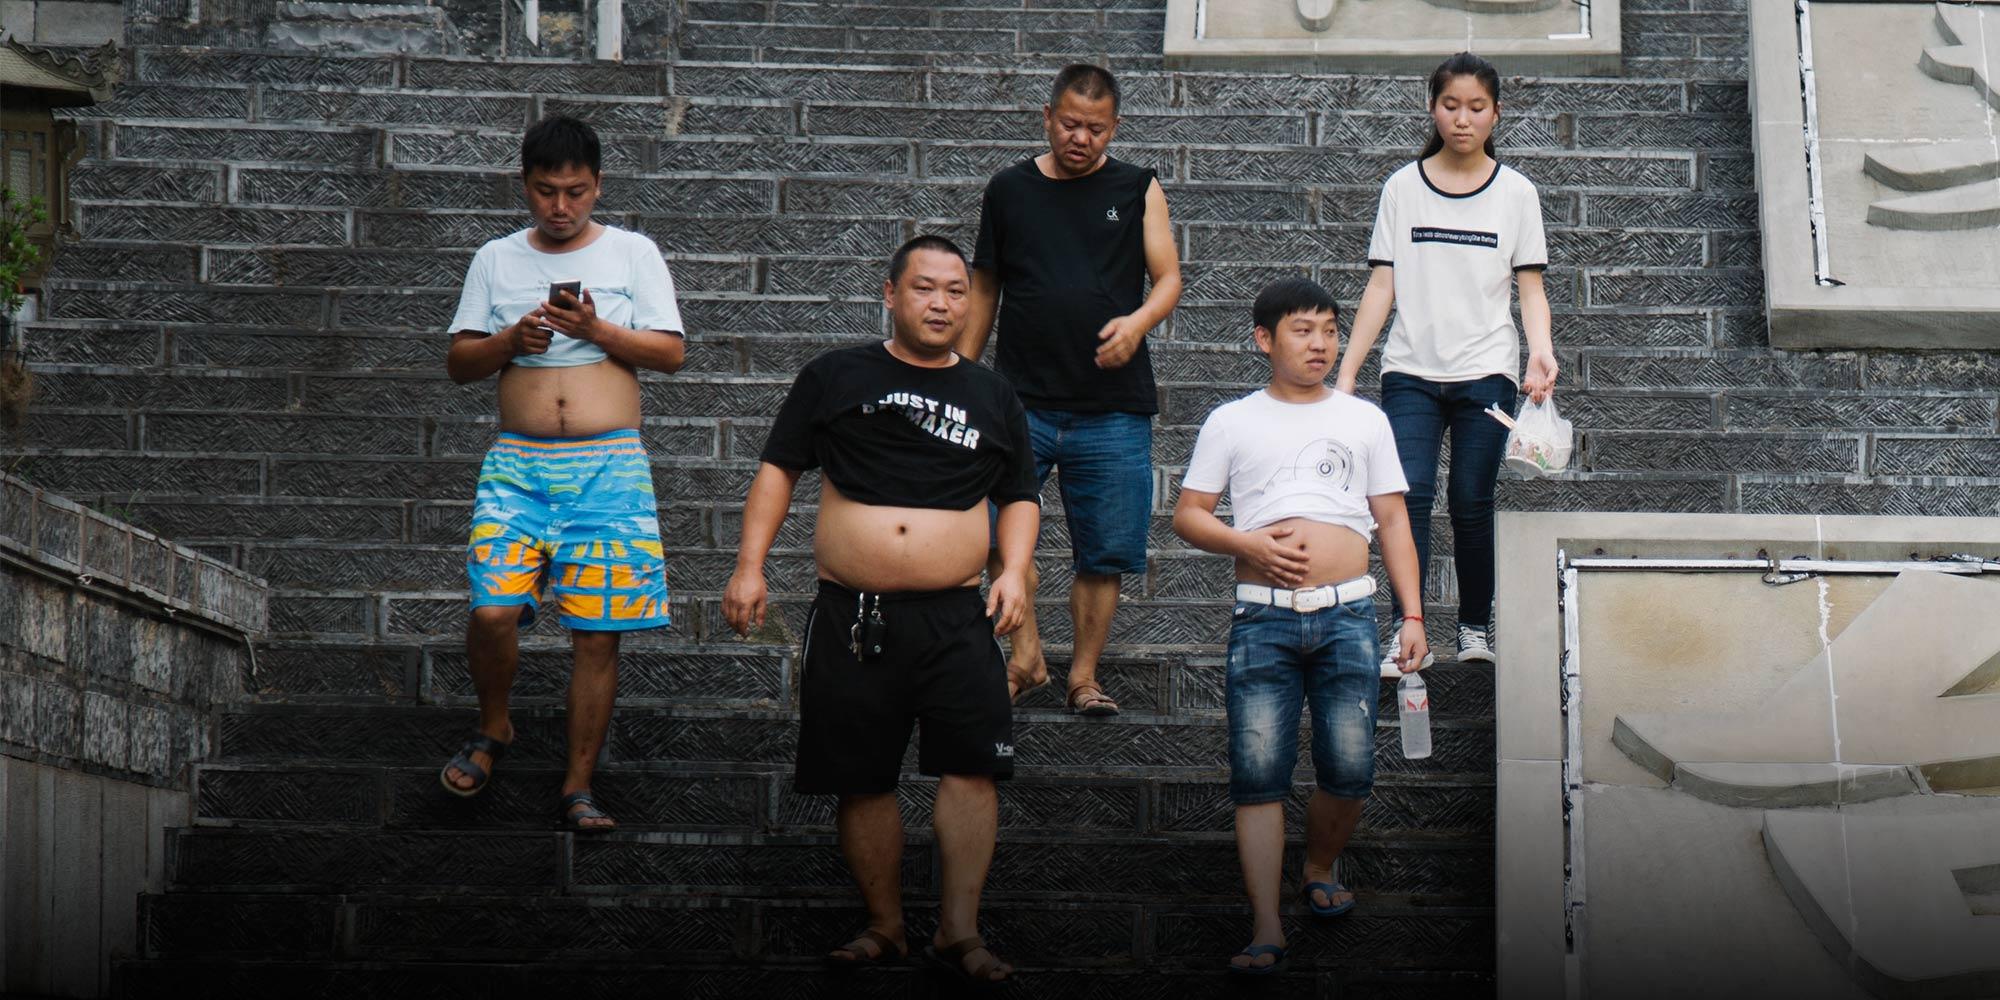 beijing bikini的圖片搜尋結果